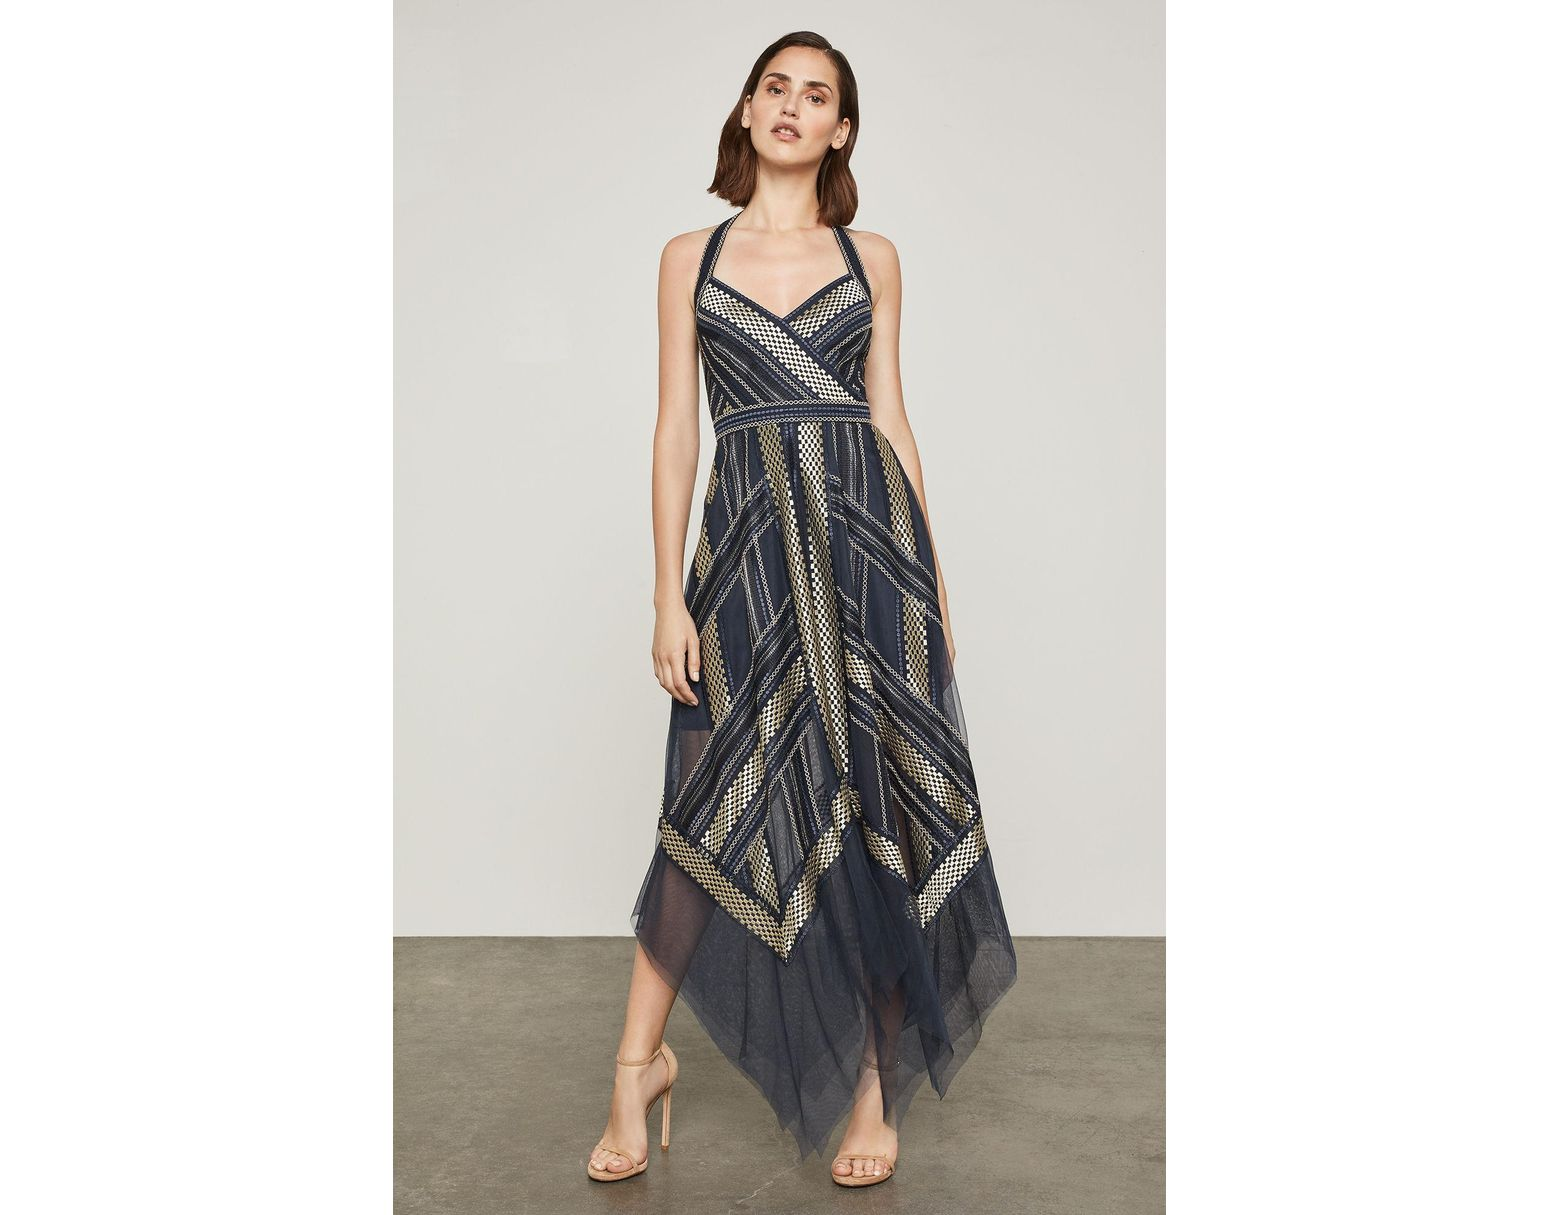 a07db007fa58 BCBGMAXAZRIA Bcbg Metallic Striped Handkerchief Dress - Lyst